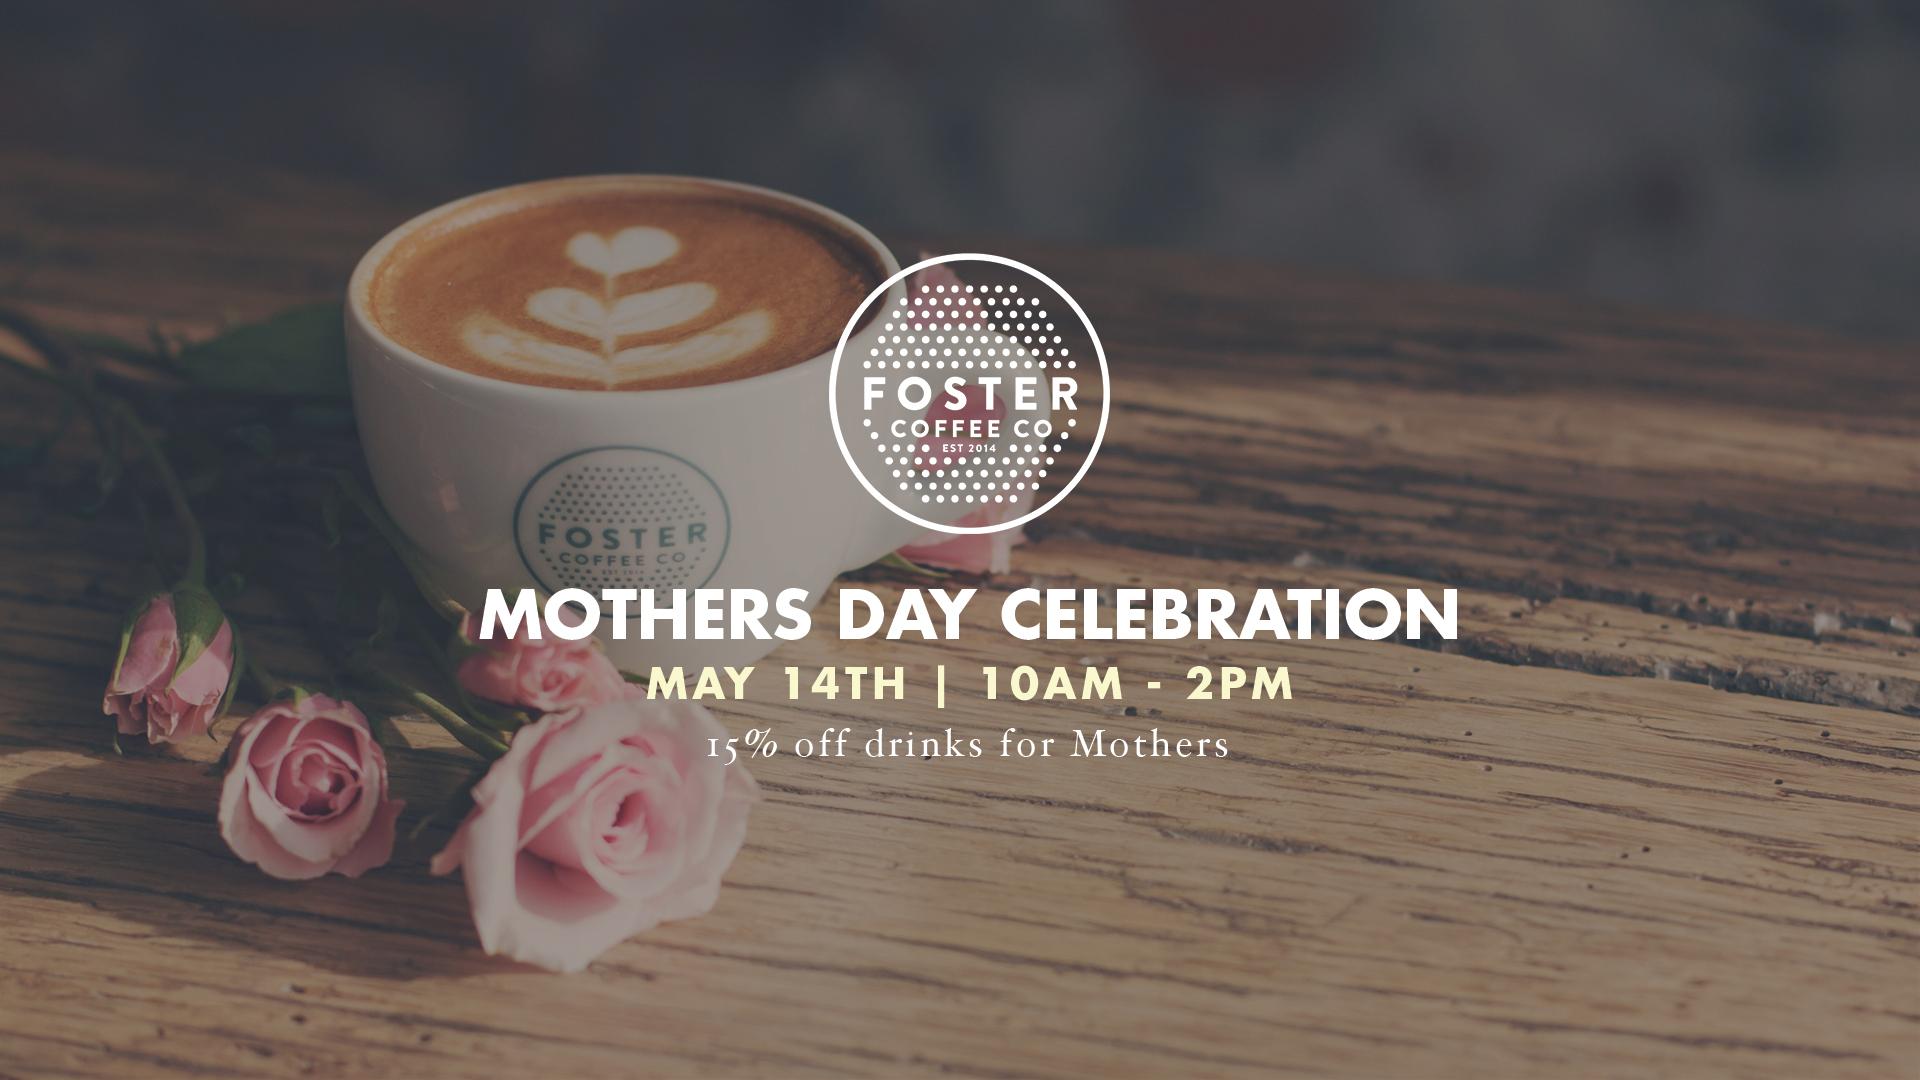 mothersday5.14.17.jpg